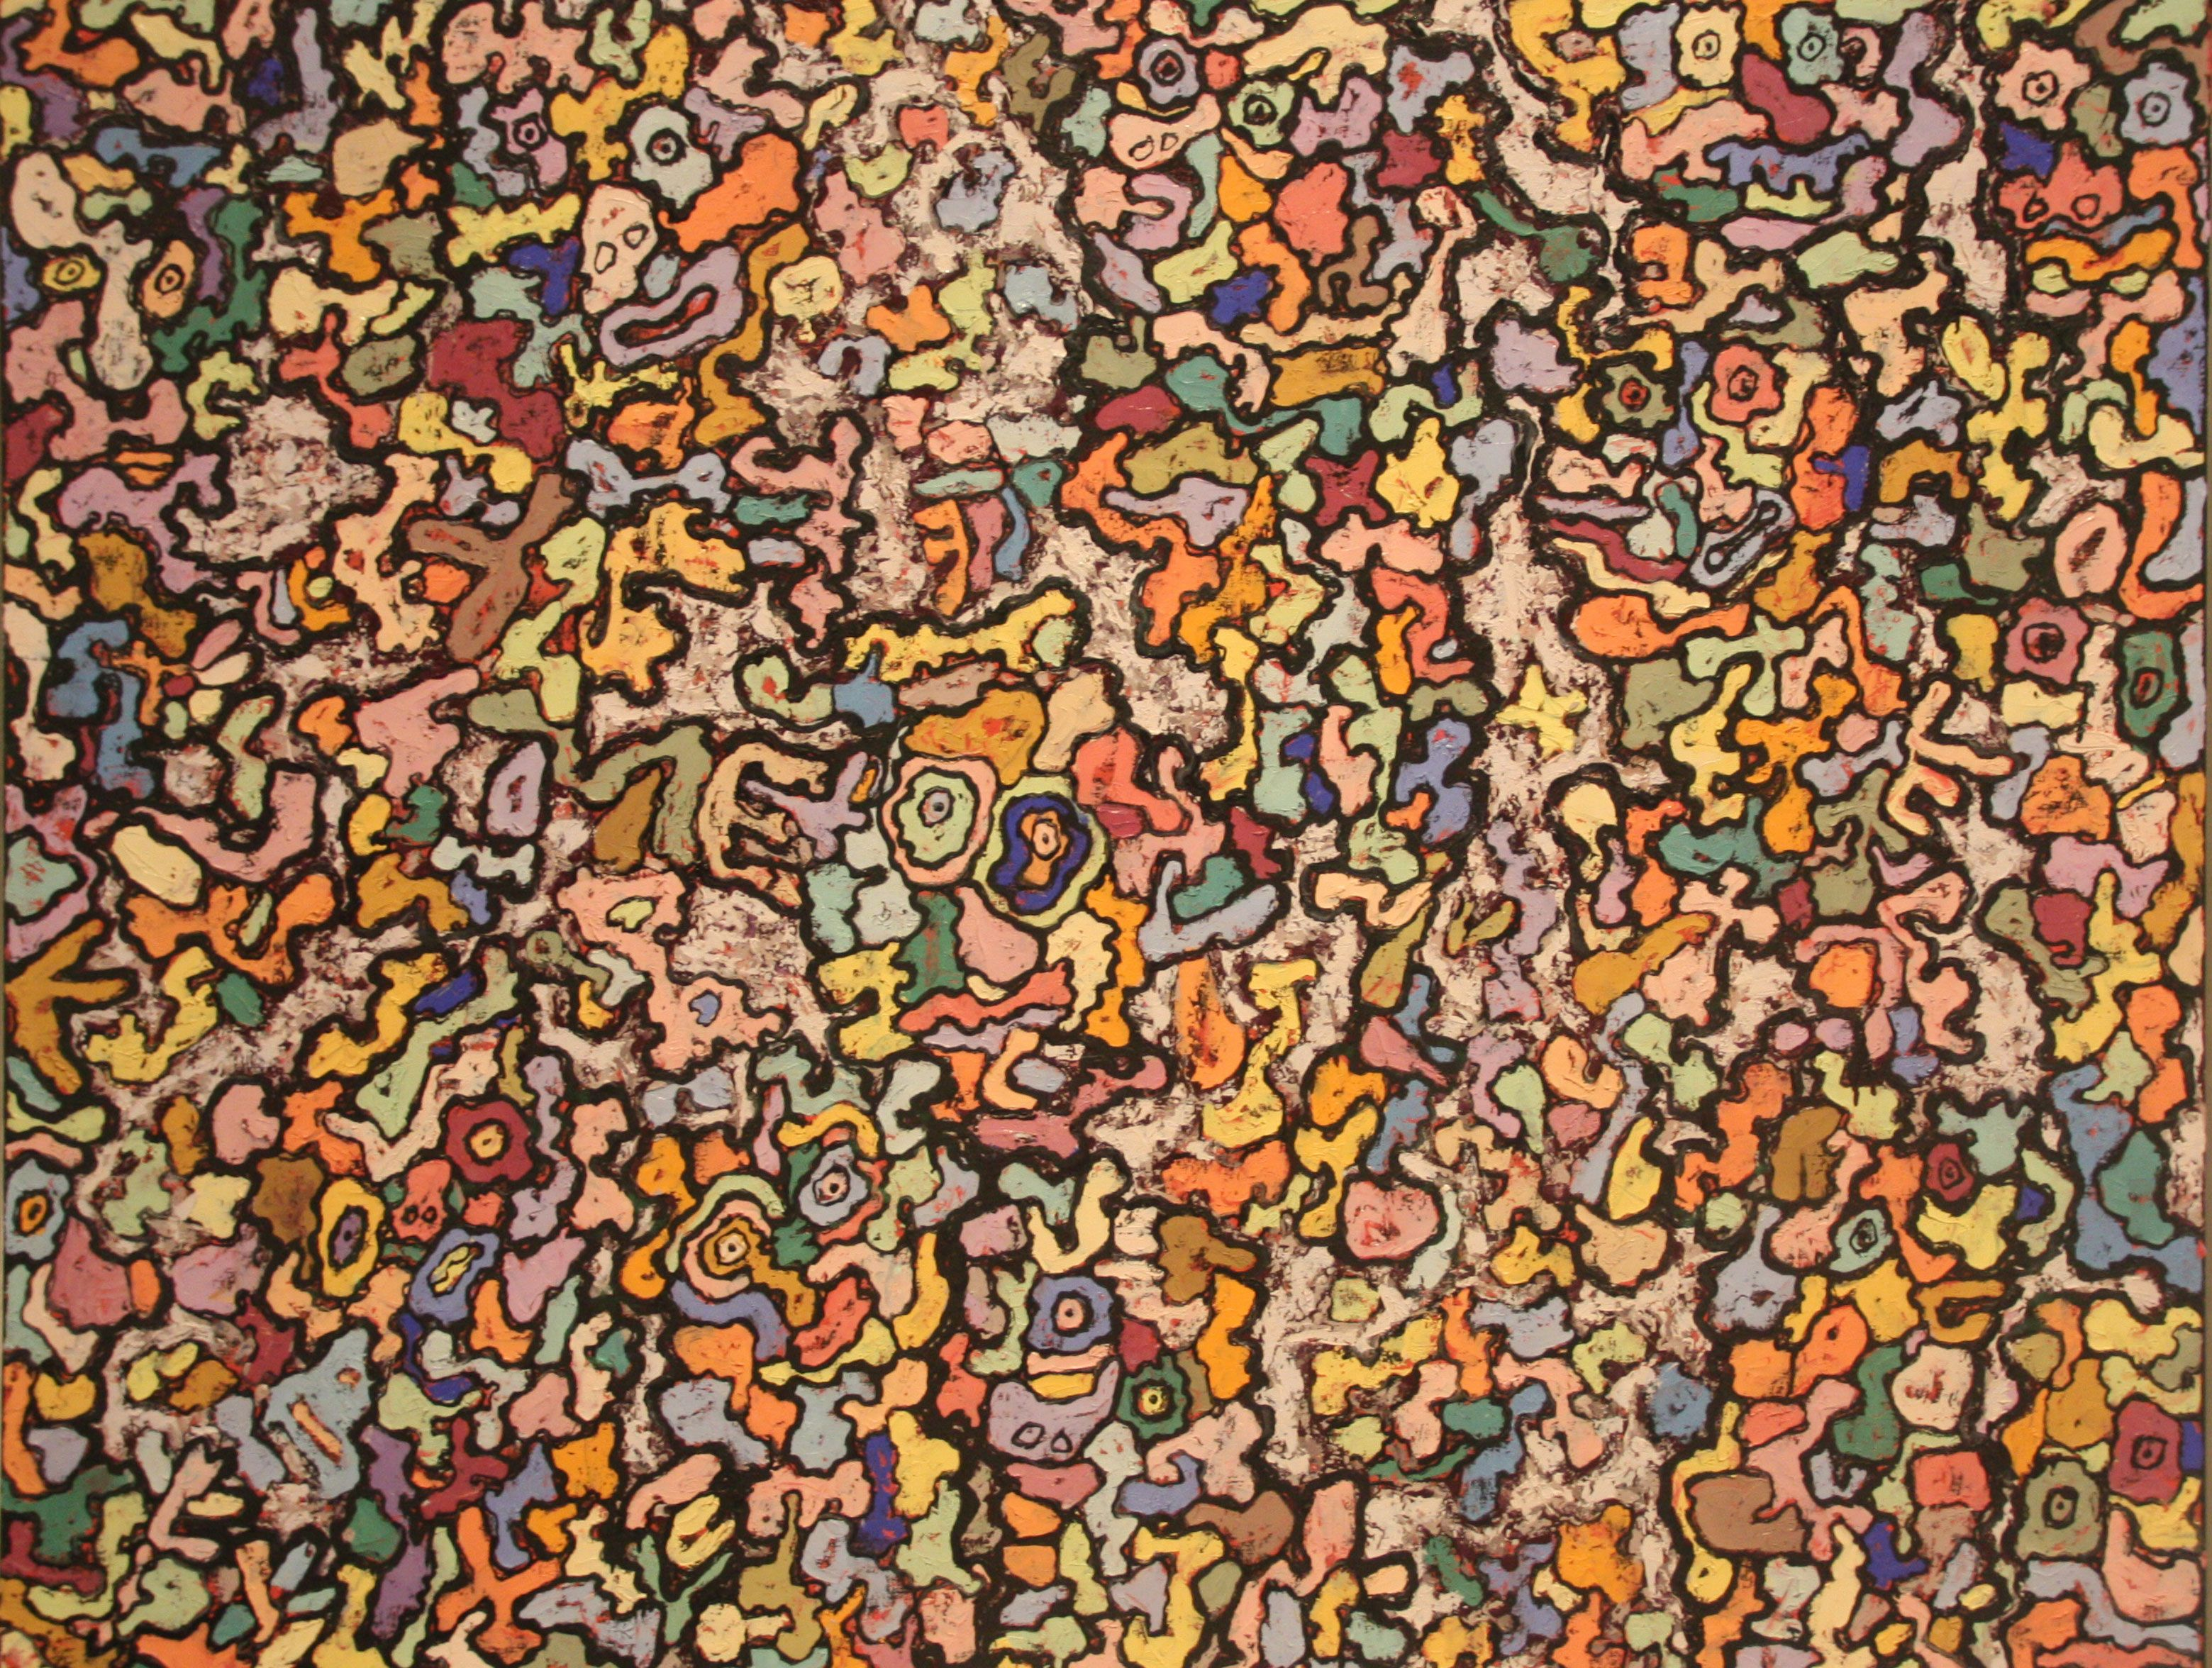 Jean Dubuffet Centre Pompidou Malaga Espa A Pinterest Jean  # Muebles Mogar Malaga